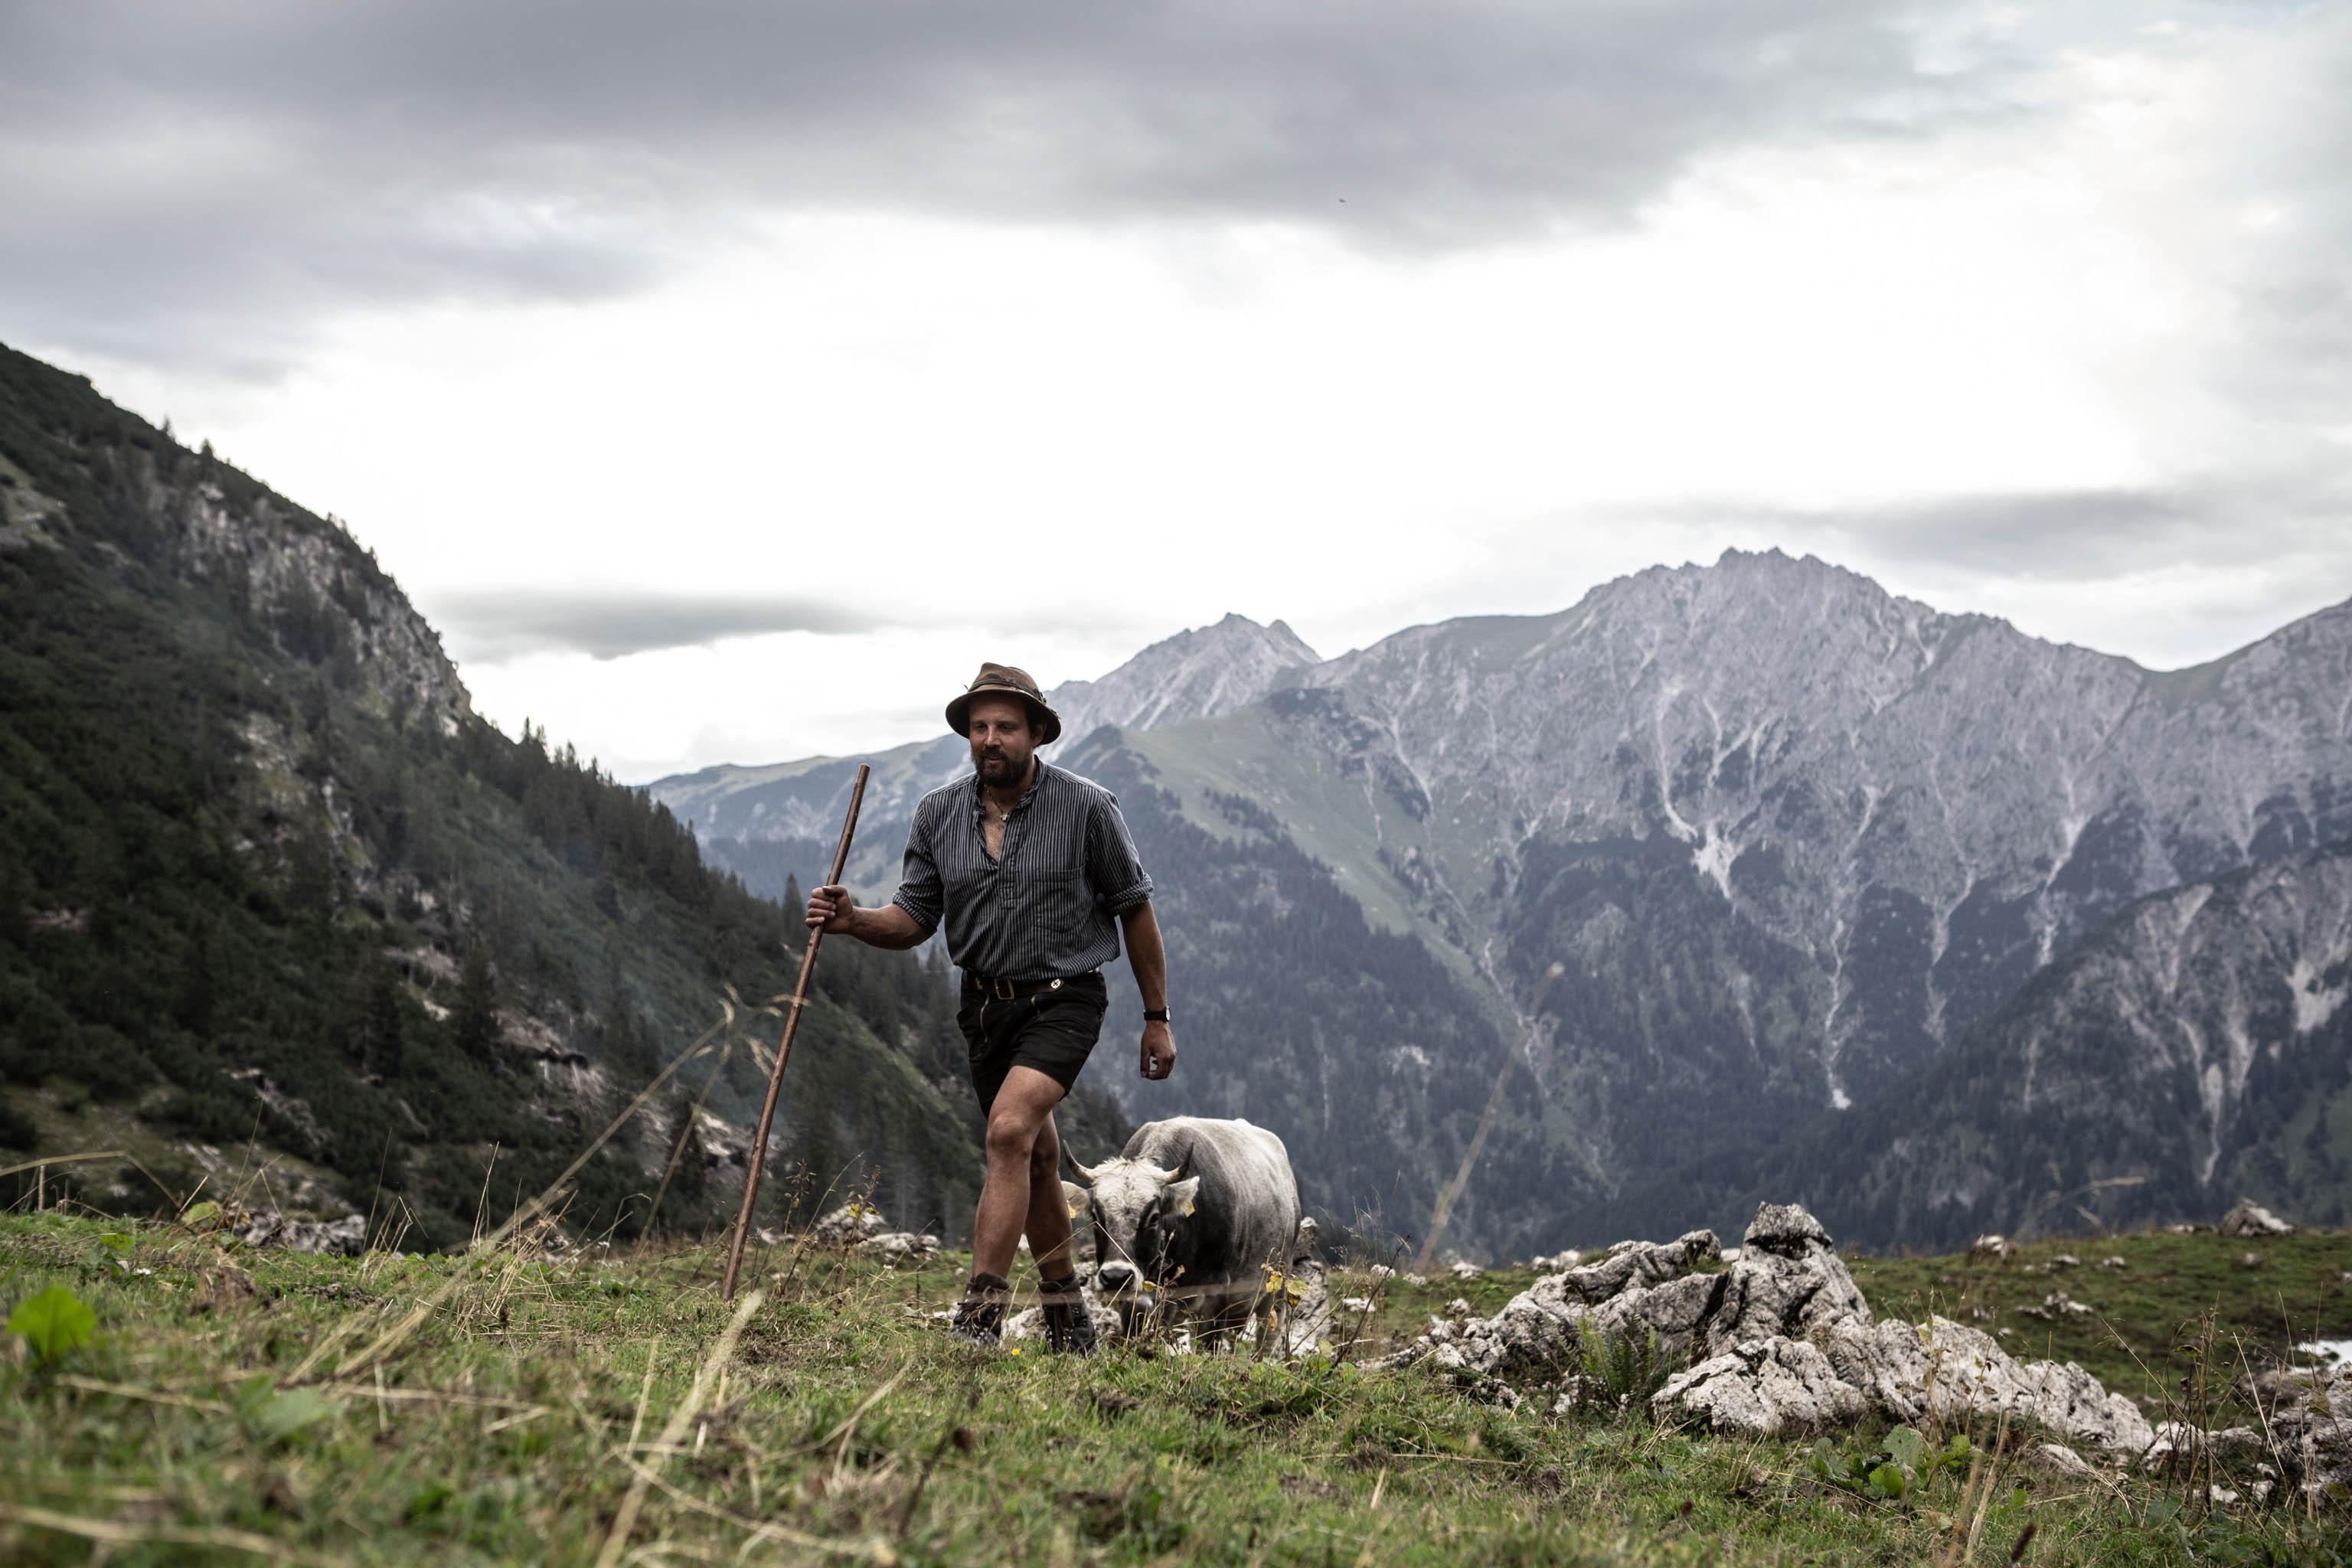 Mountain farmer Georg Rädler at his mountain hut in the Allgäu region of Bavaria